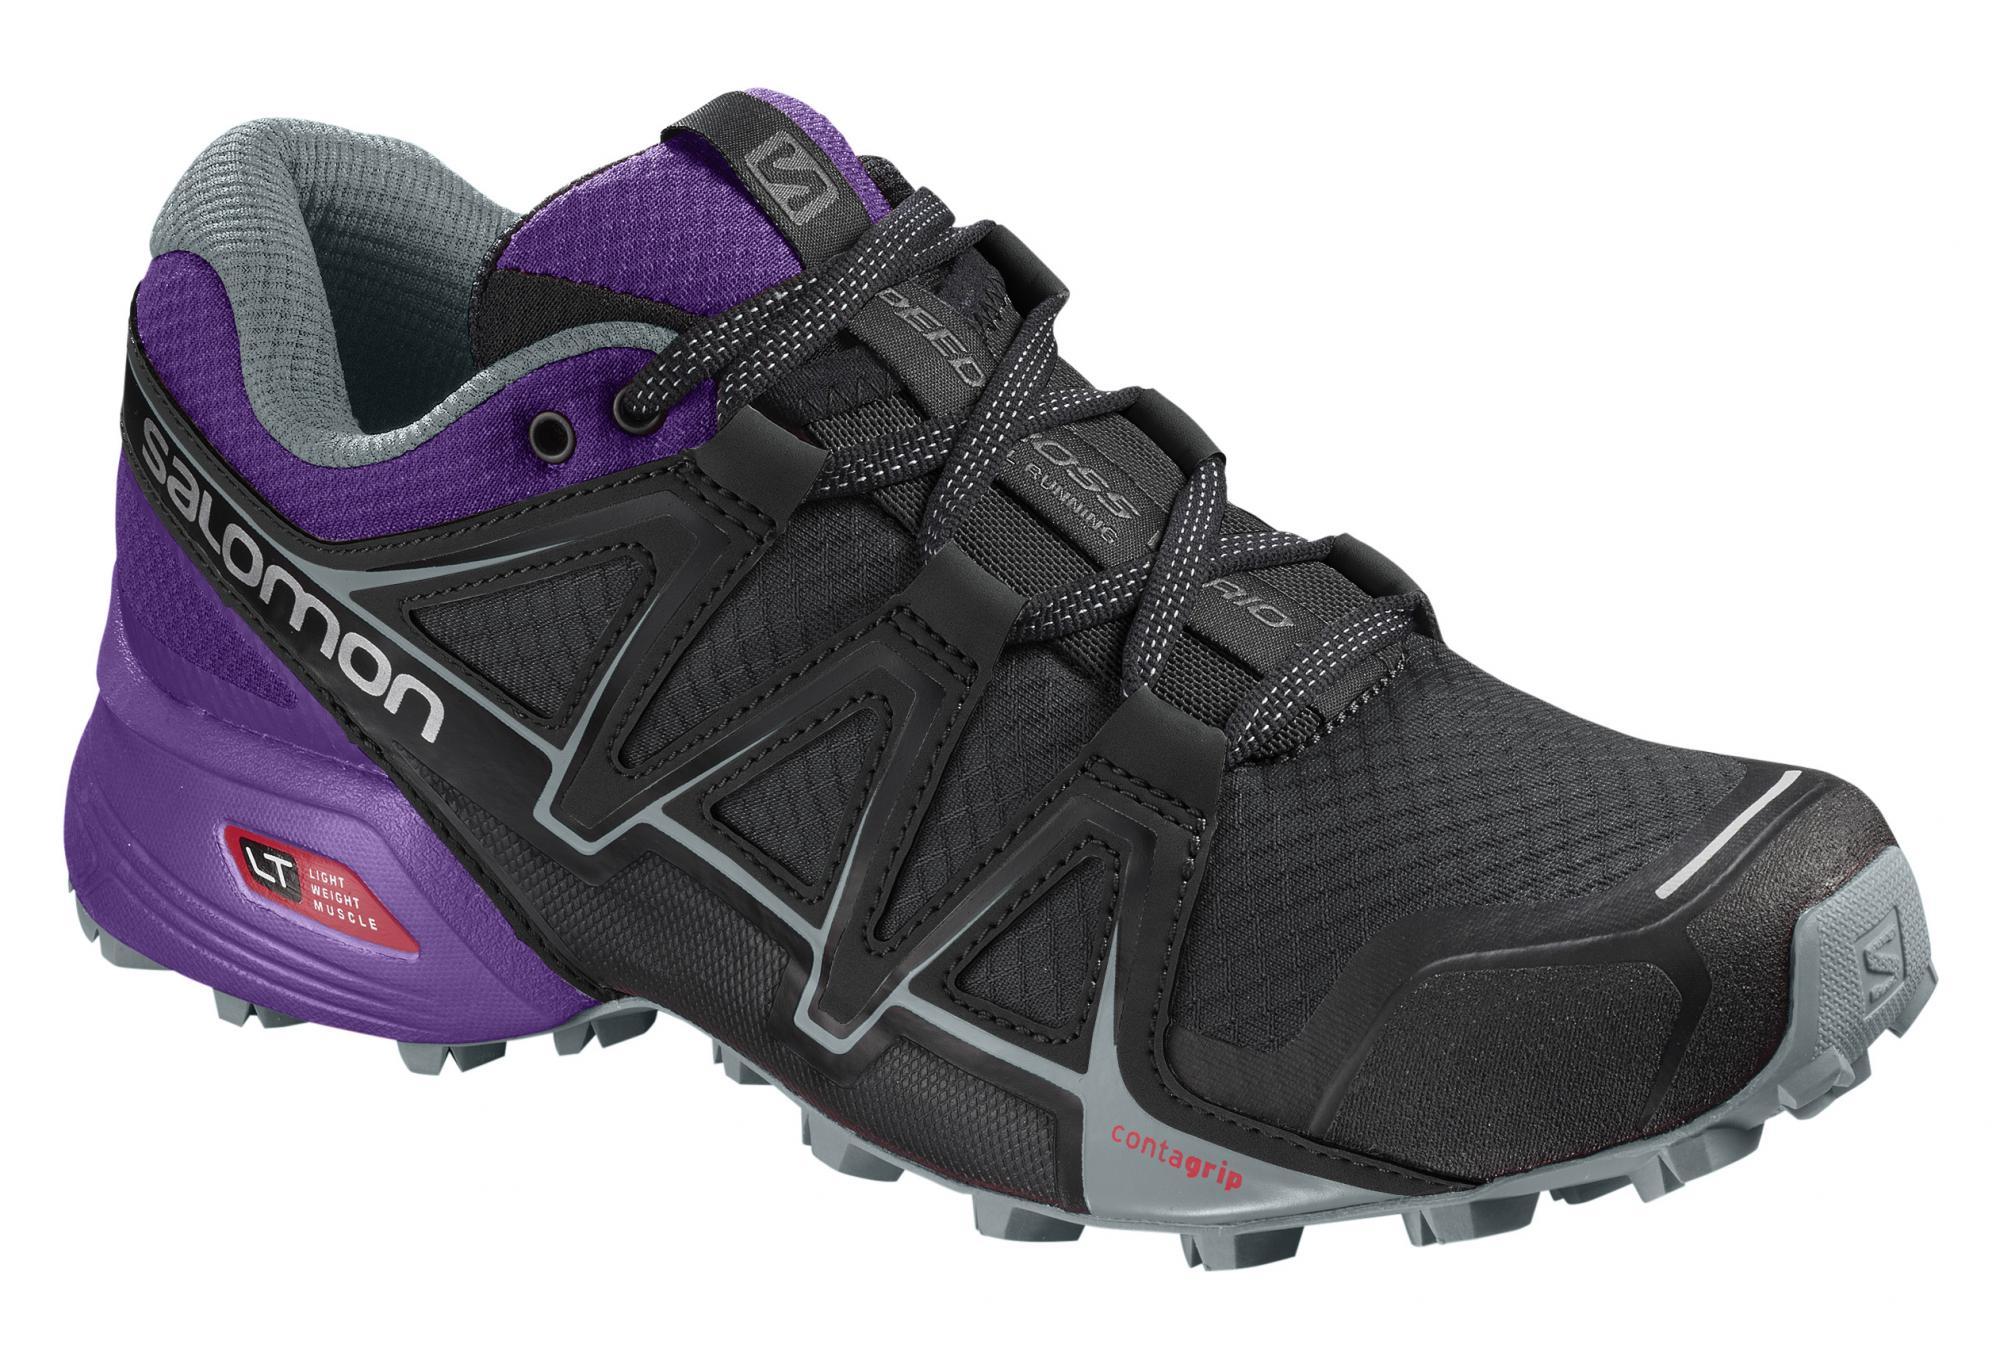 Salomon Speedcross Women's Shoes Vario